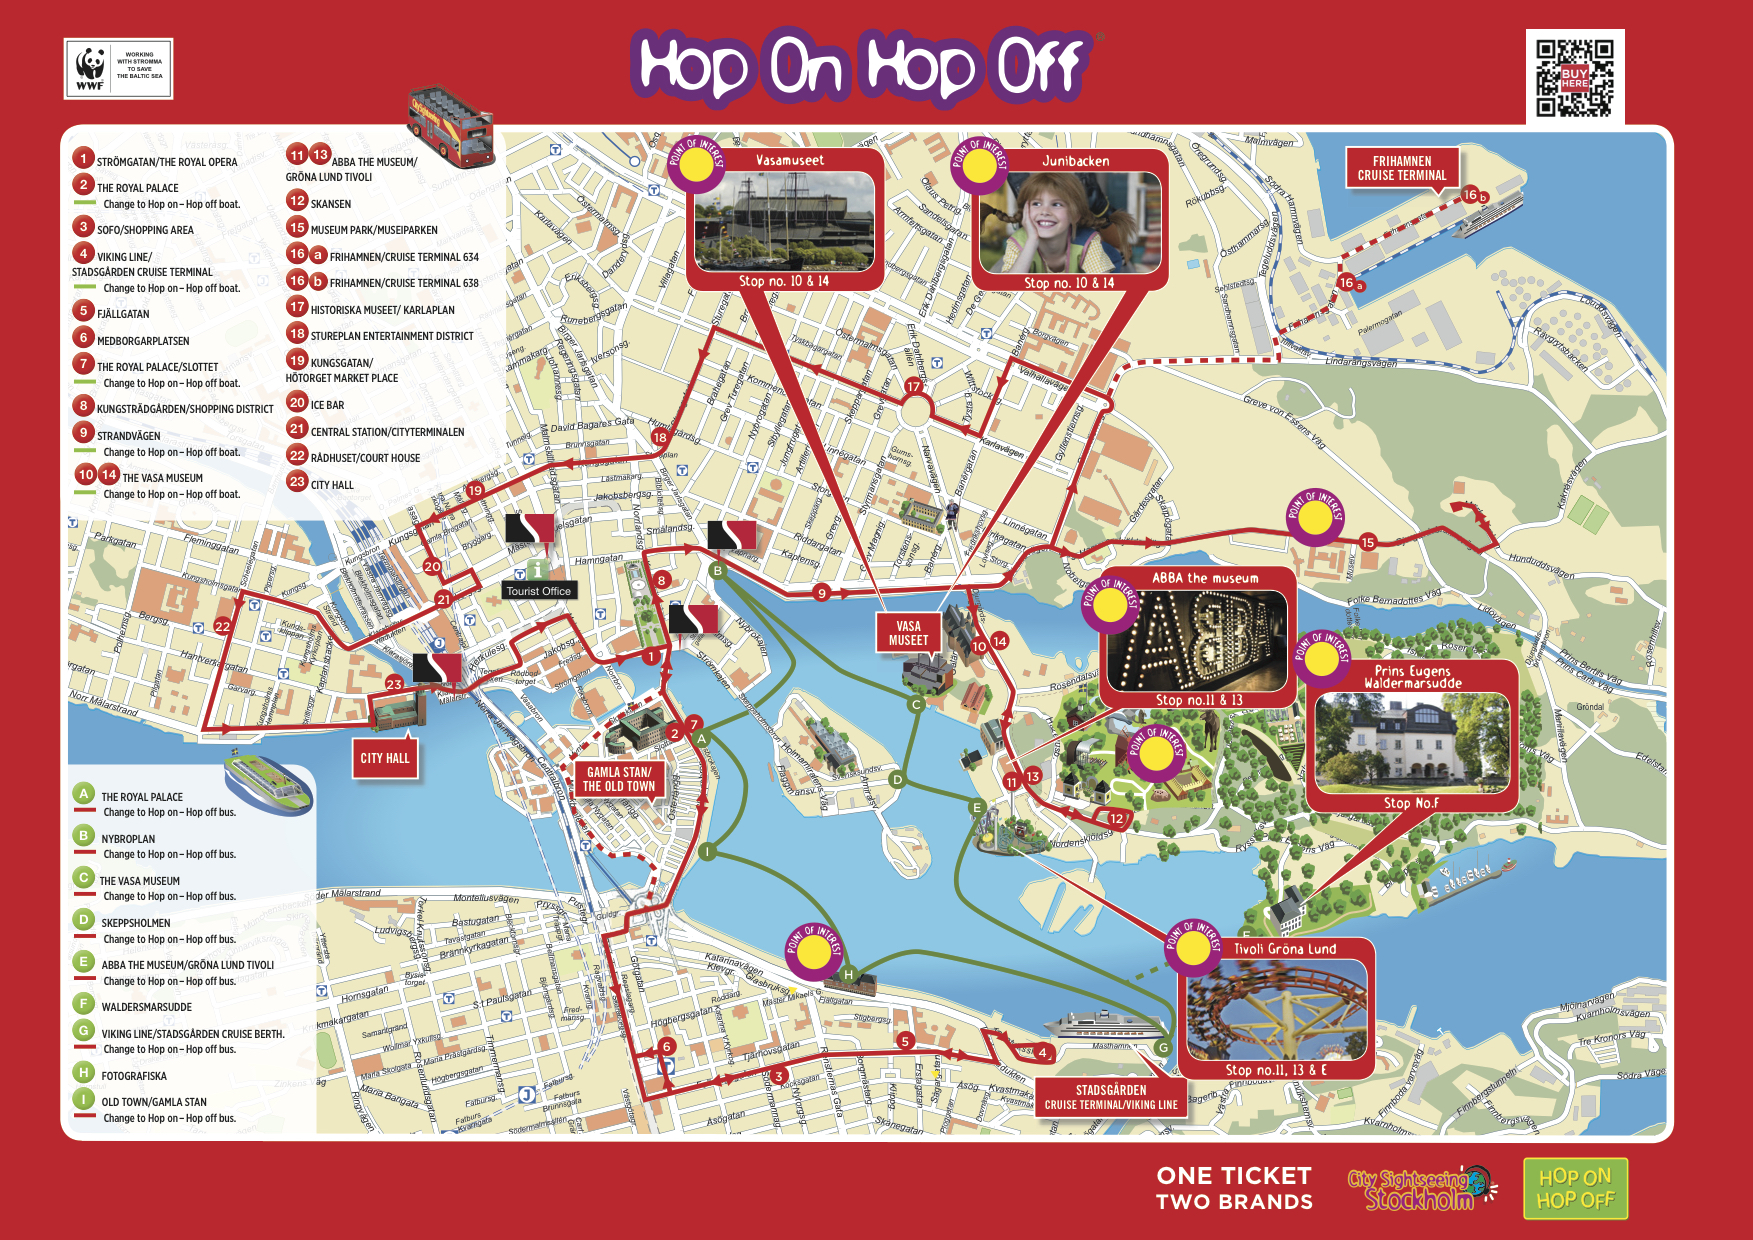 Stockholm Hop-On Hop-Off Bus Tour Map